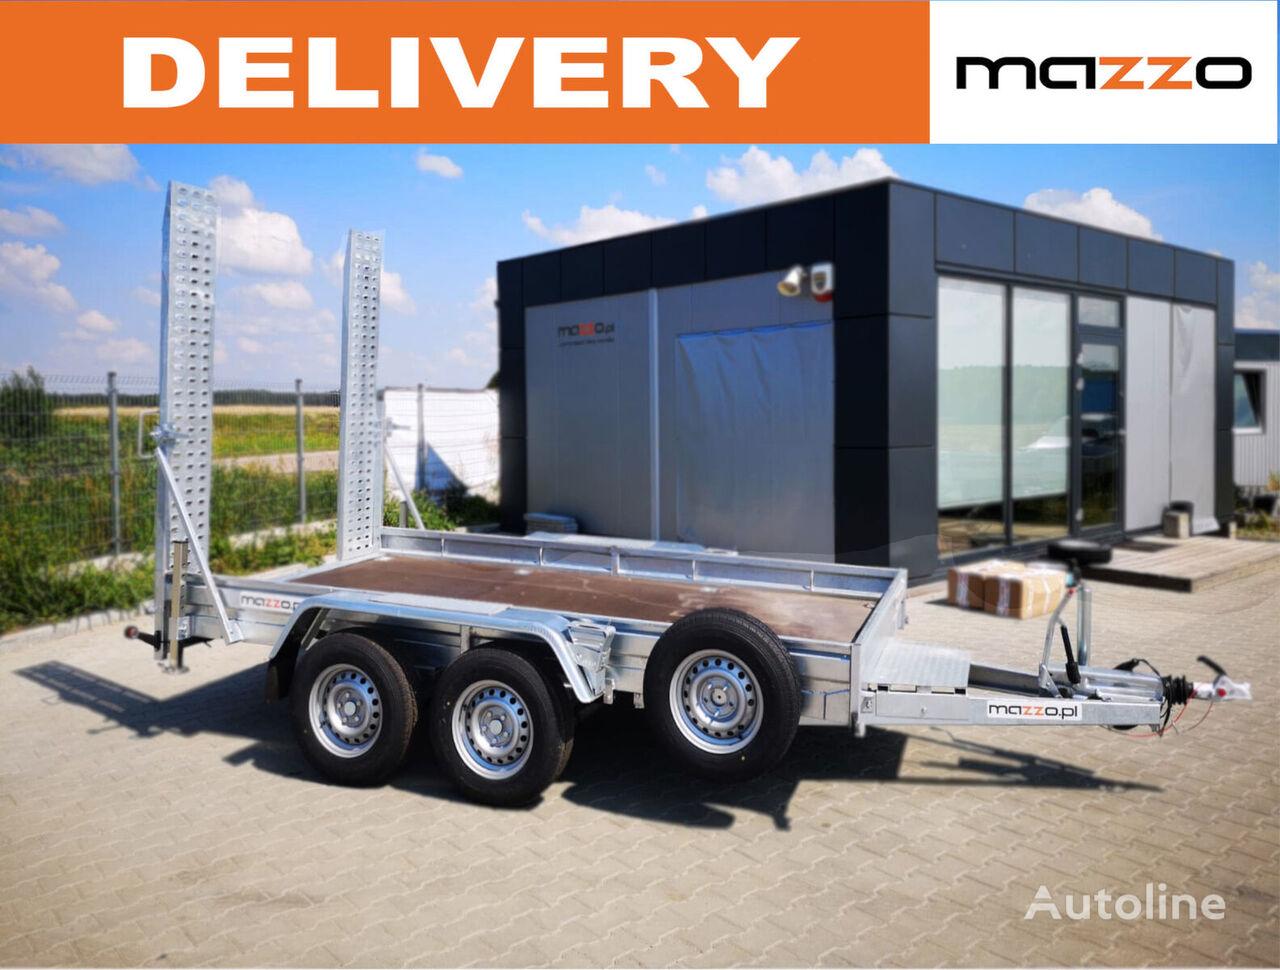 K3535 Plant digger trailer, for machine transporter remolque de cama baja nuevo